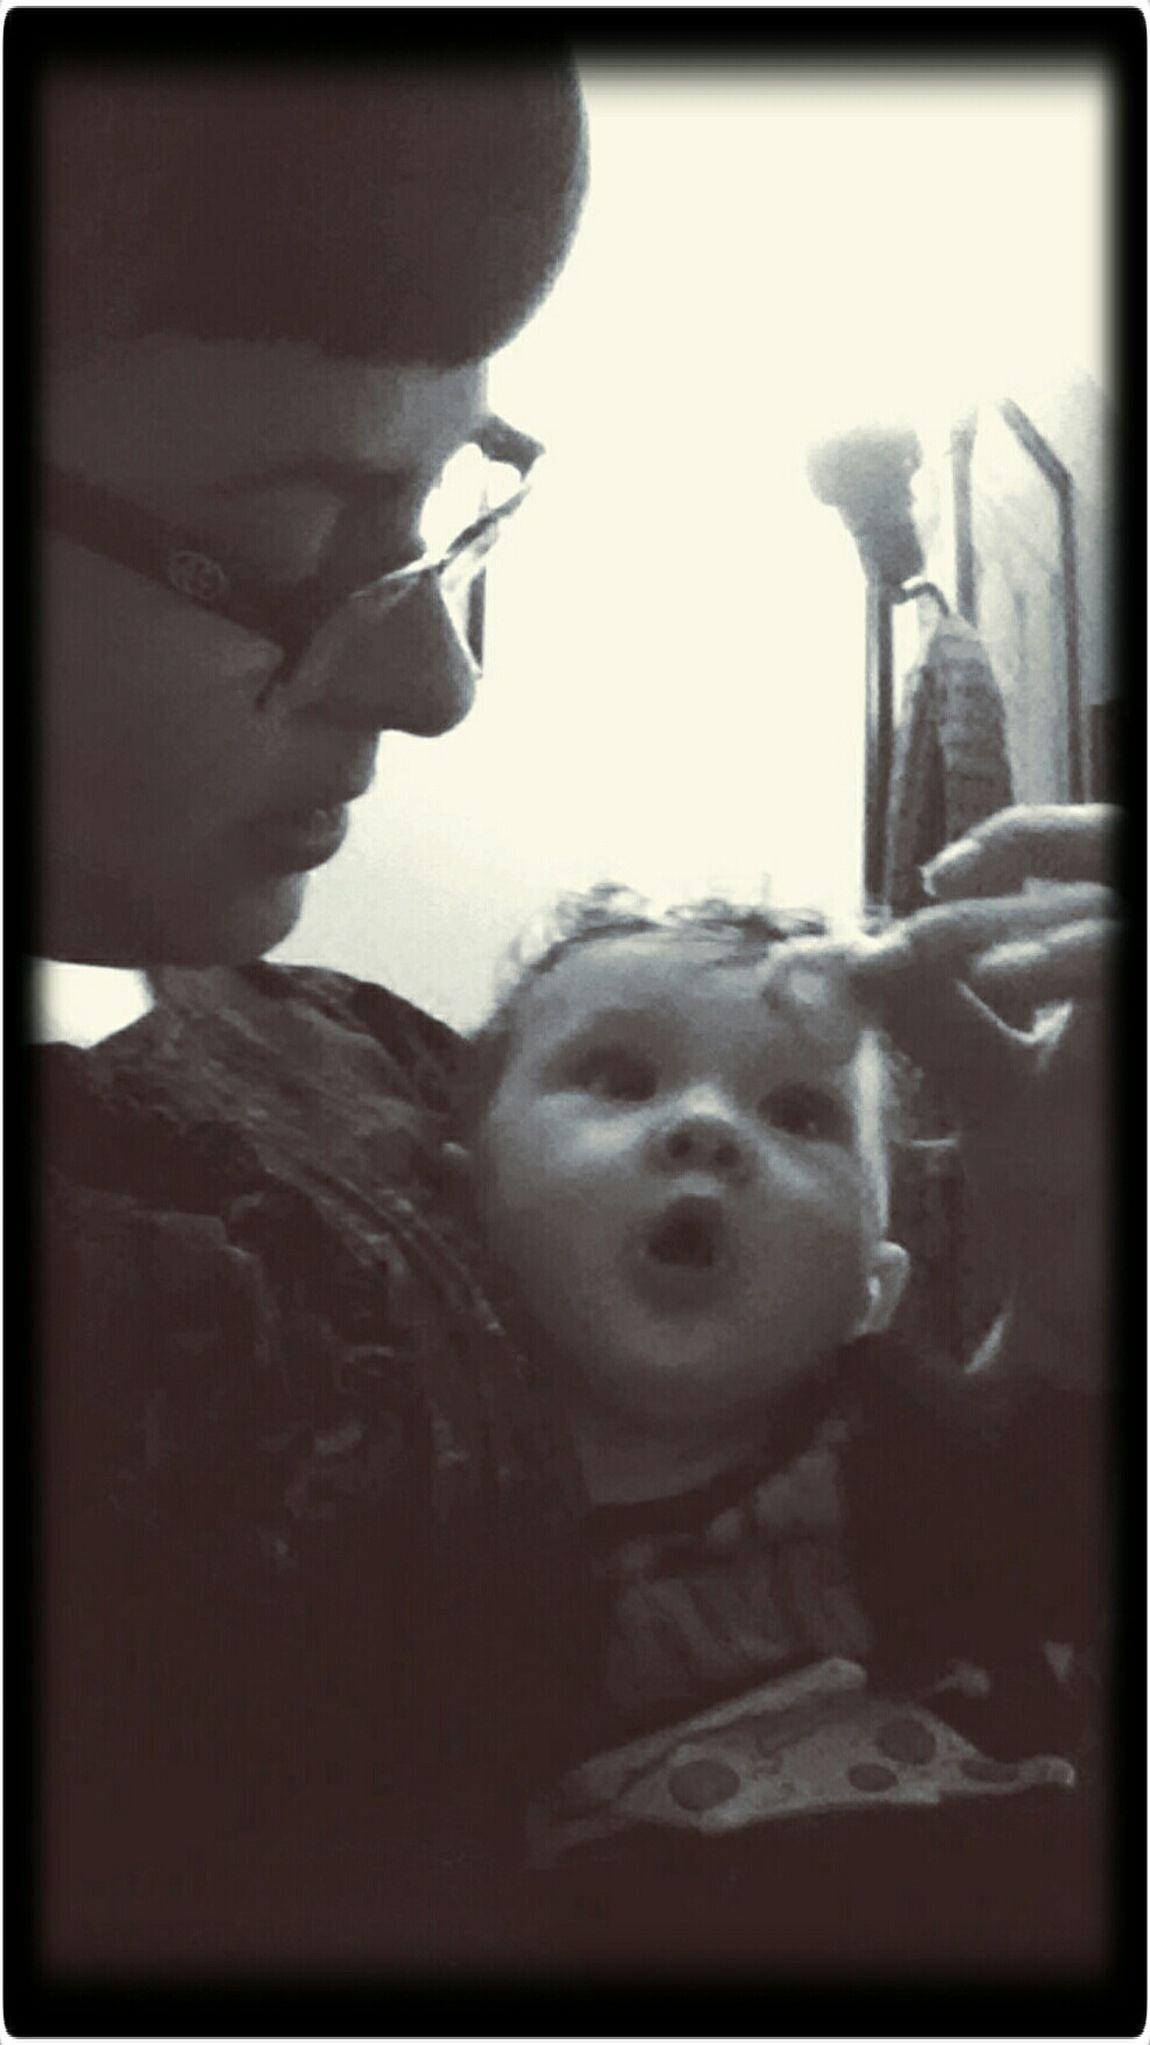 My Boy ❤ Priceless @jalmengual Oohbellaa